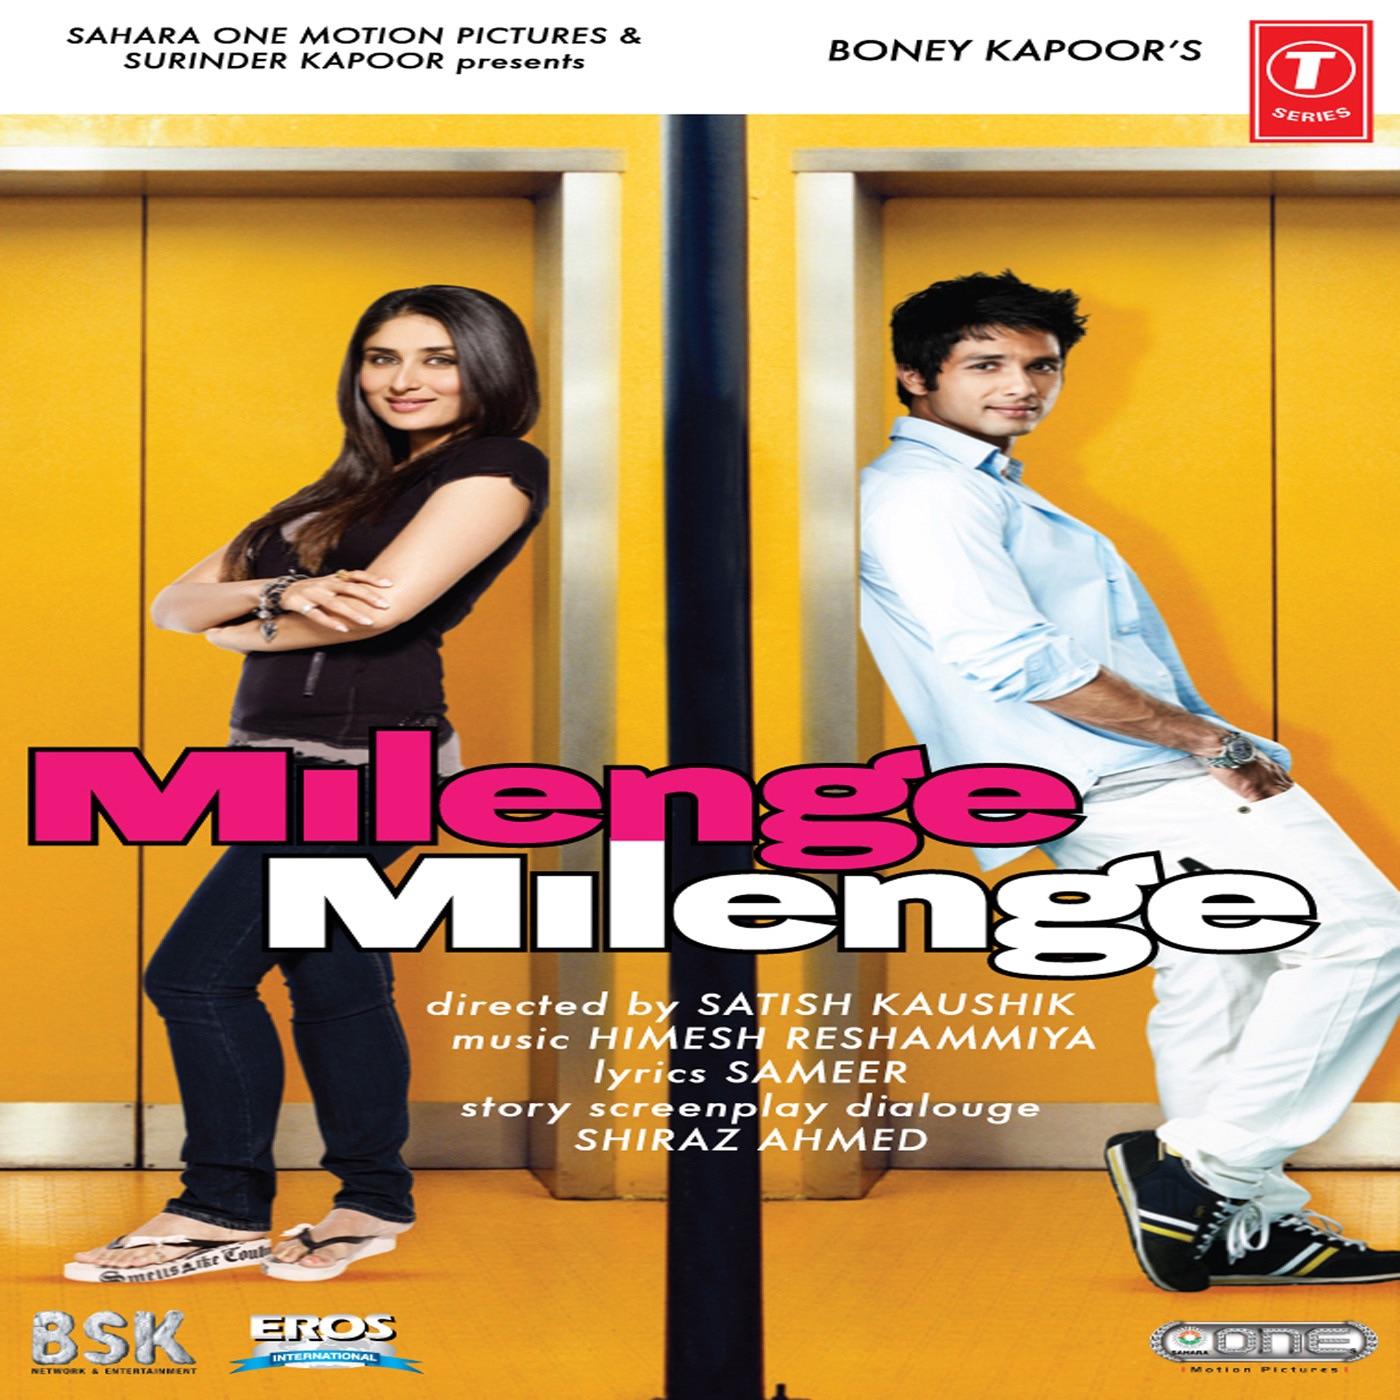 Milenge Milenge Hindi Movie Song Download